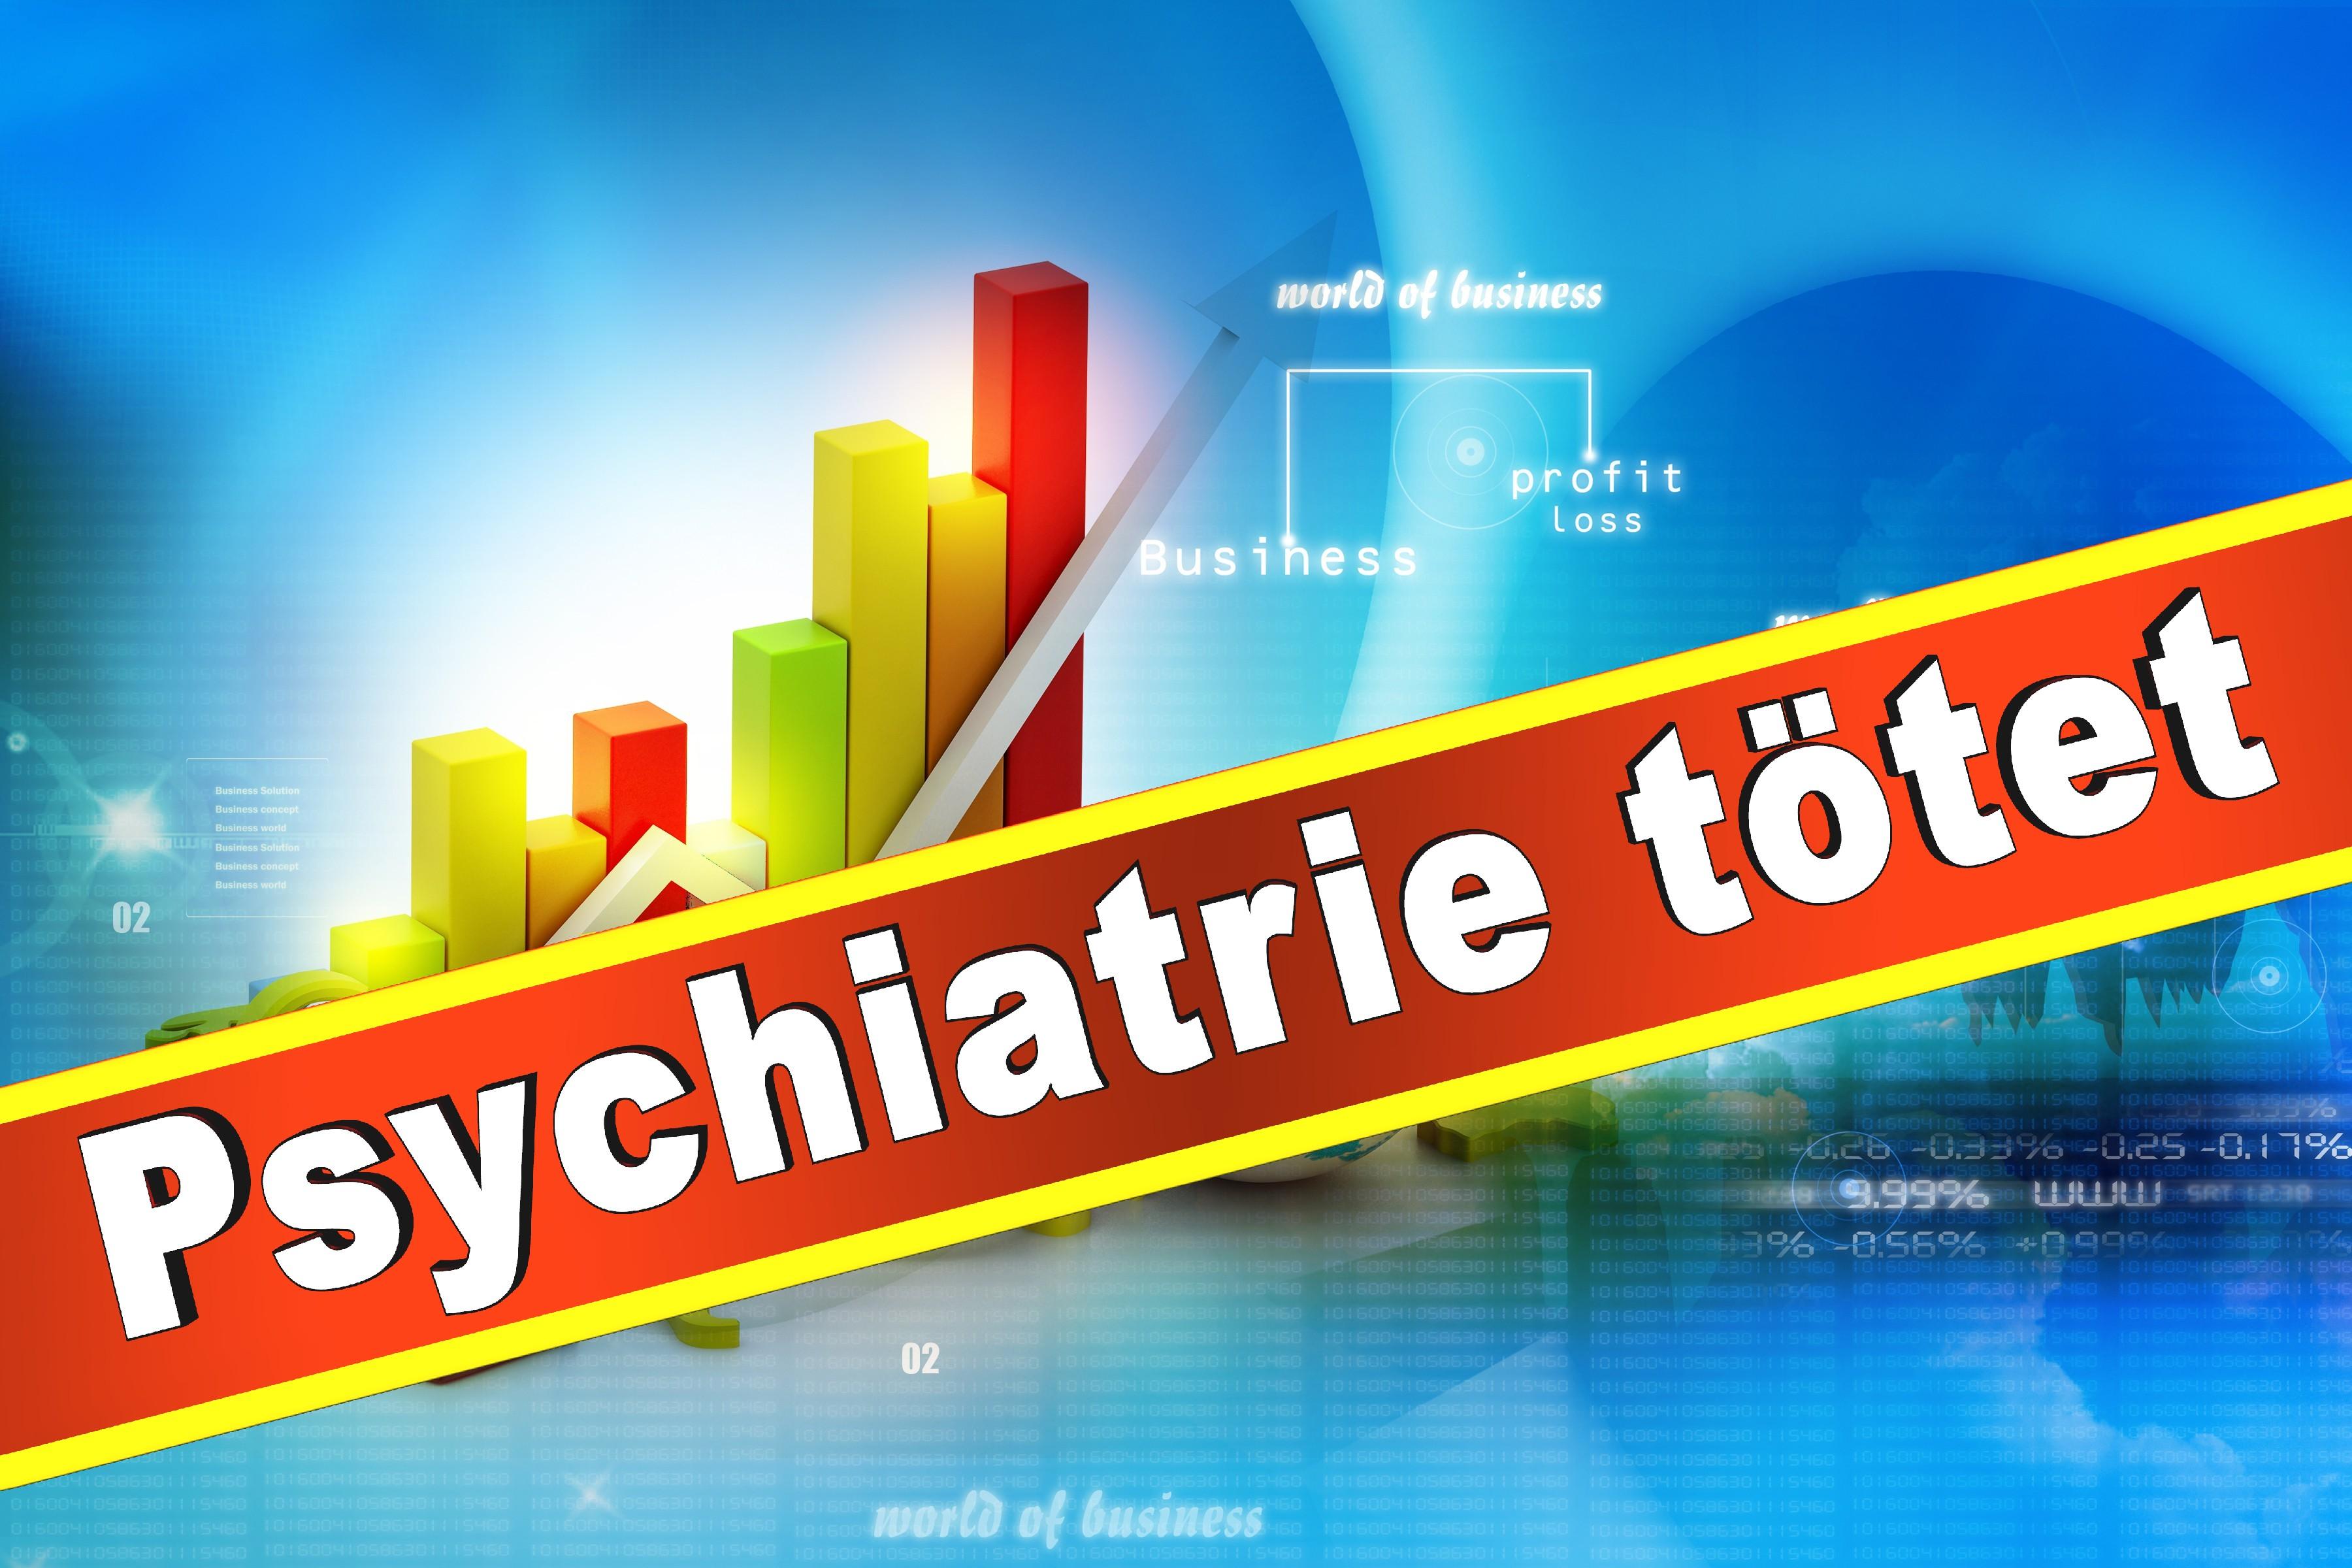 Dr Norbert Mayer Amberg Psychiater Hannover Gutachten Psychiater Facharzt Psychiatrie